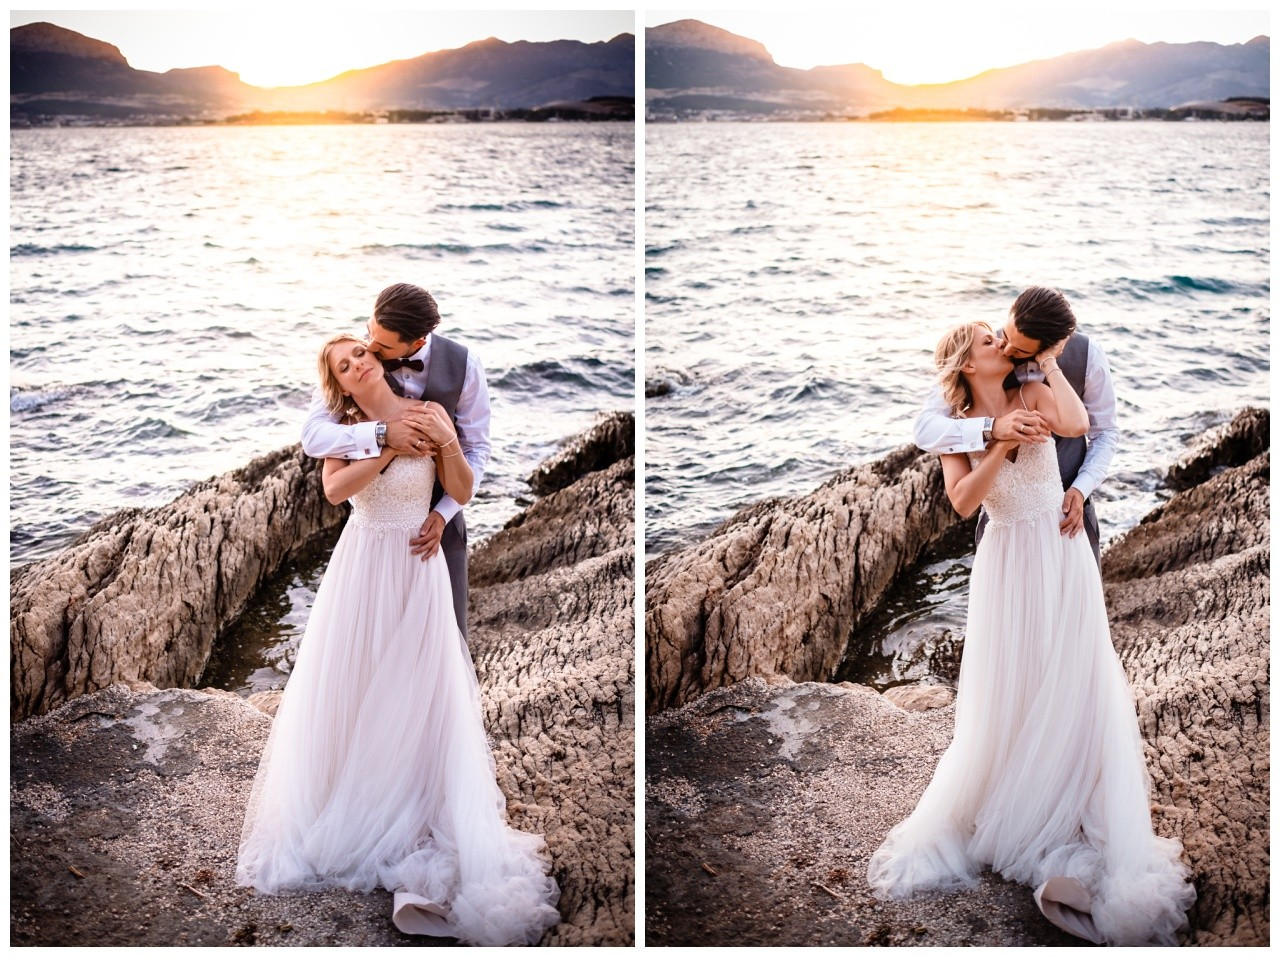 hochzeitsfotos kroatien heiraten split after wedding shooting hochzeitsfotograf 15 - Hochzeitsfotos in Kroatien